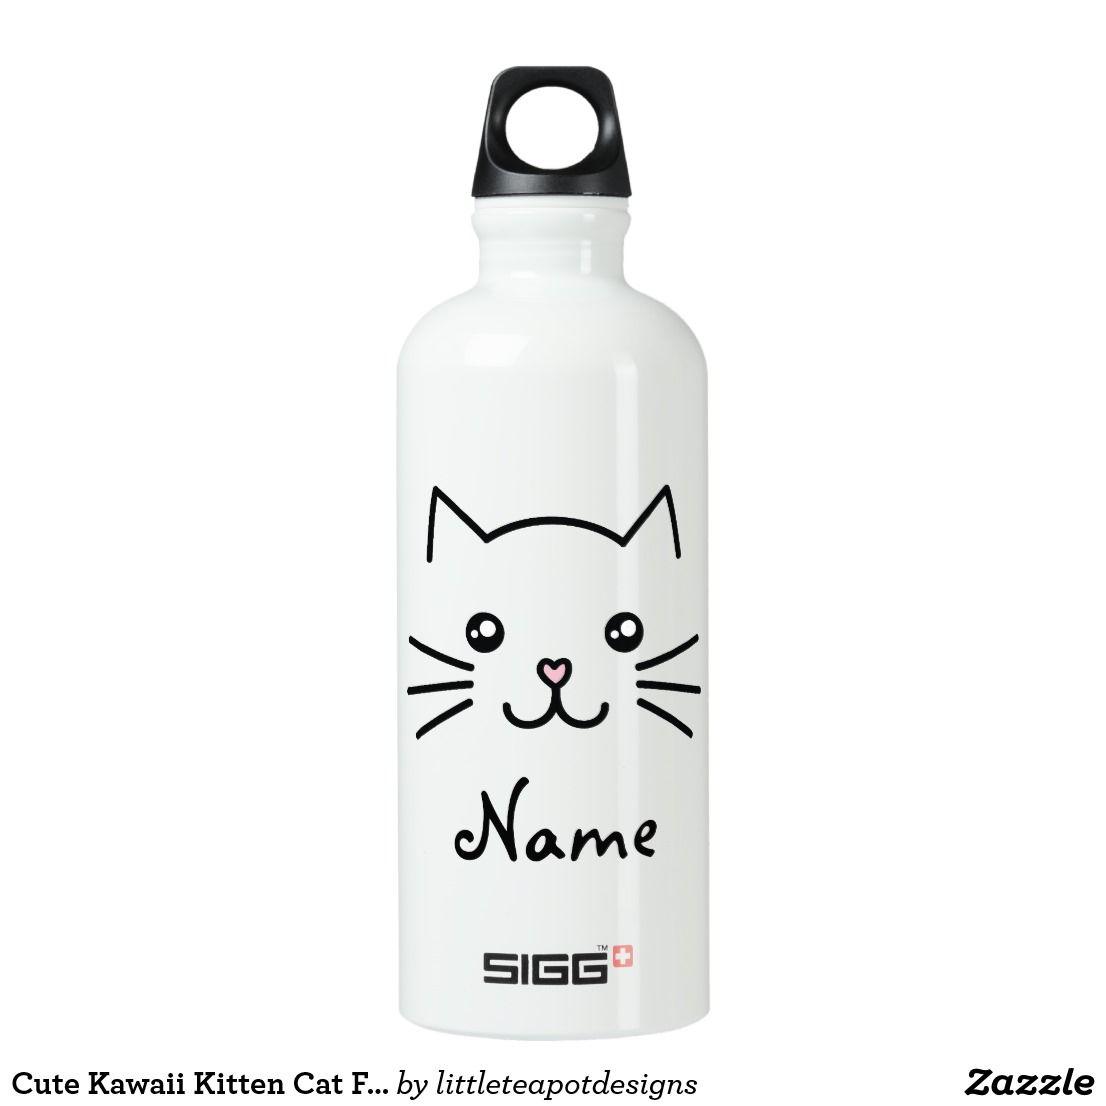 Cute Kawaii Kitten Cat Face With Pink Heart Nose Aluminum Water Bottle Zazzle Com In 2020 Aluminum Water Bottles Water Bottle Bottle